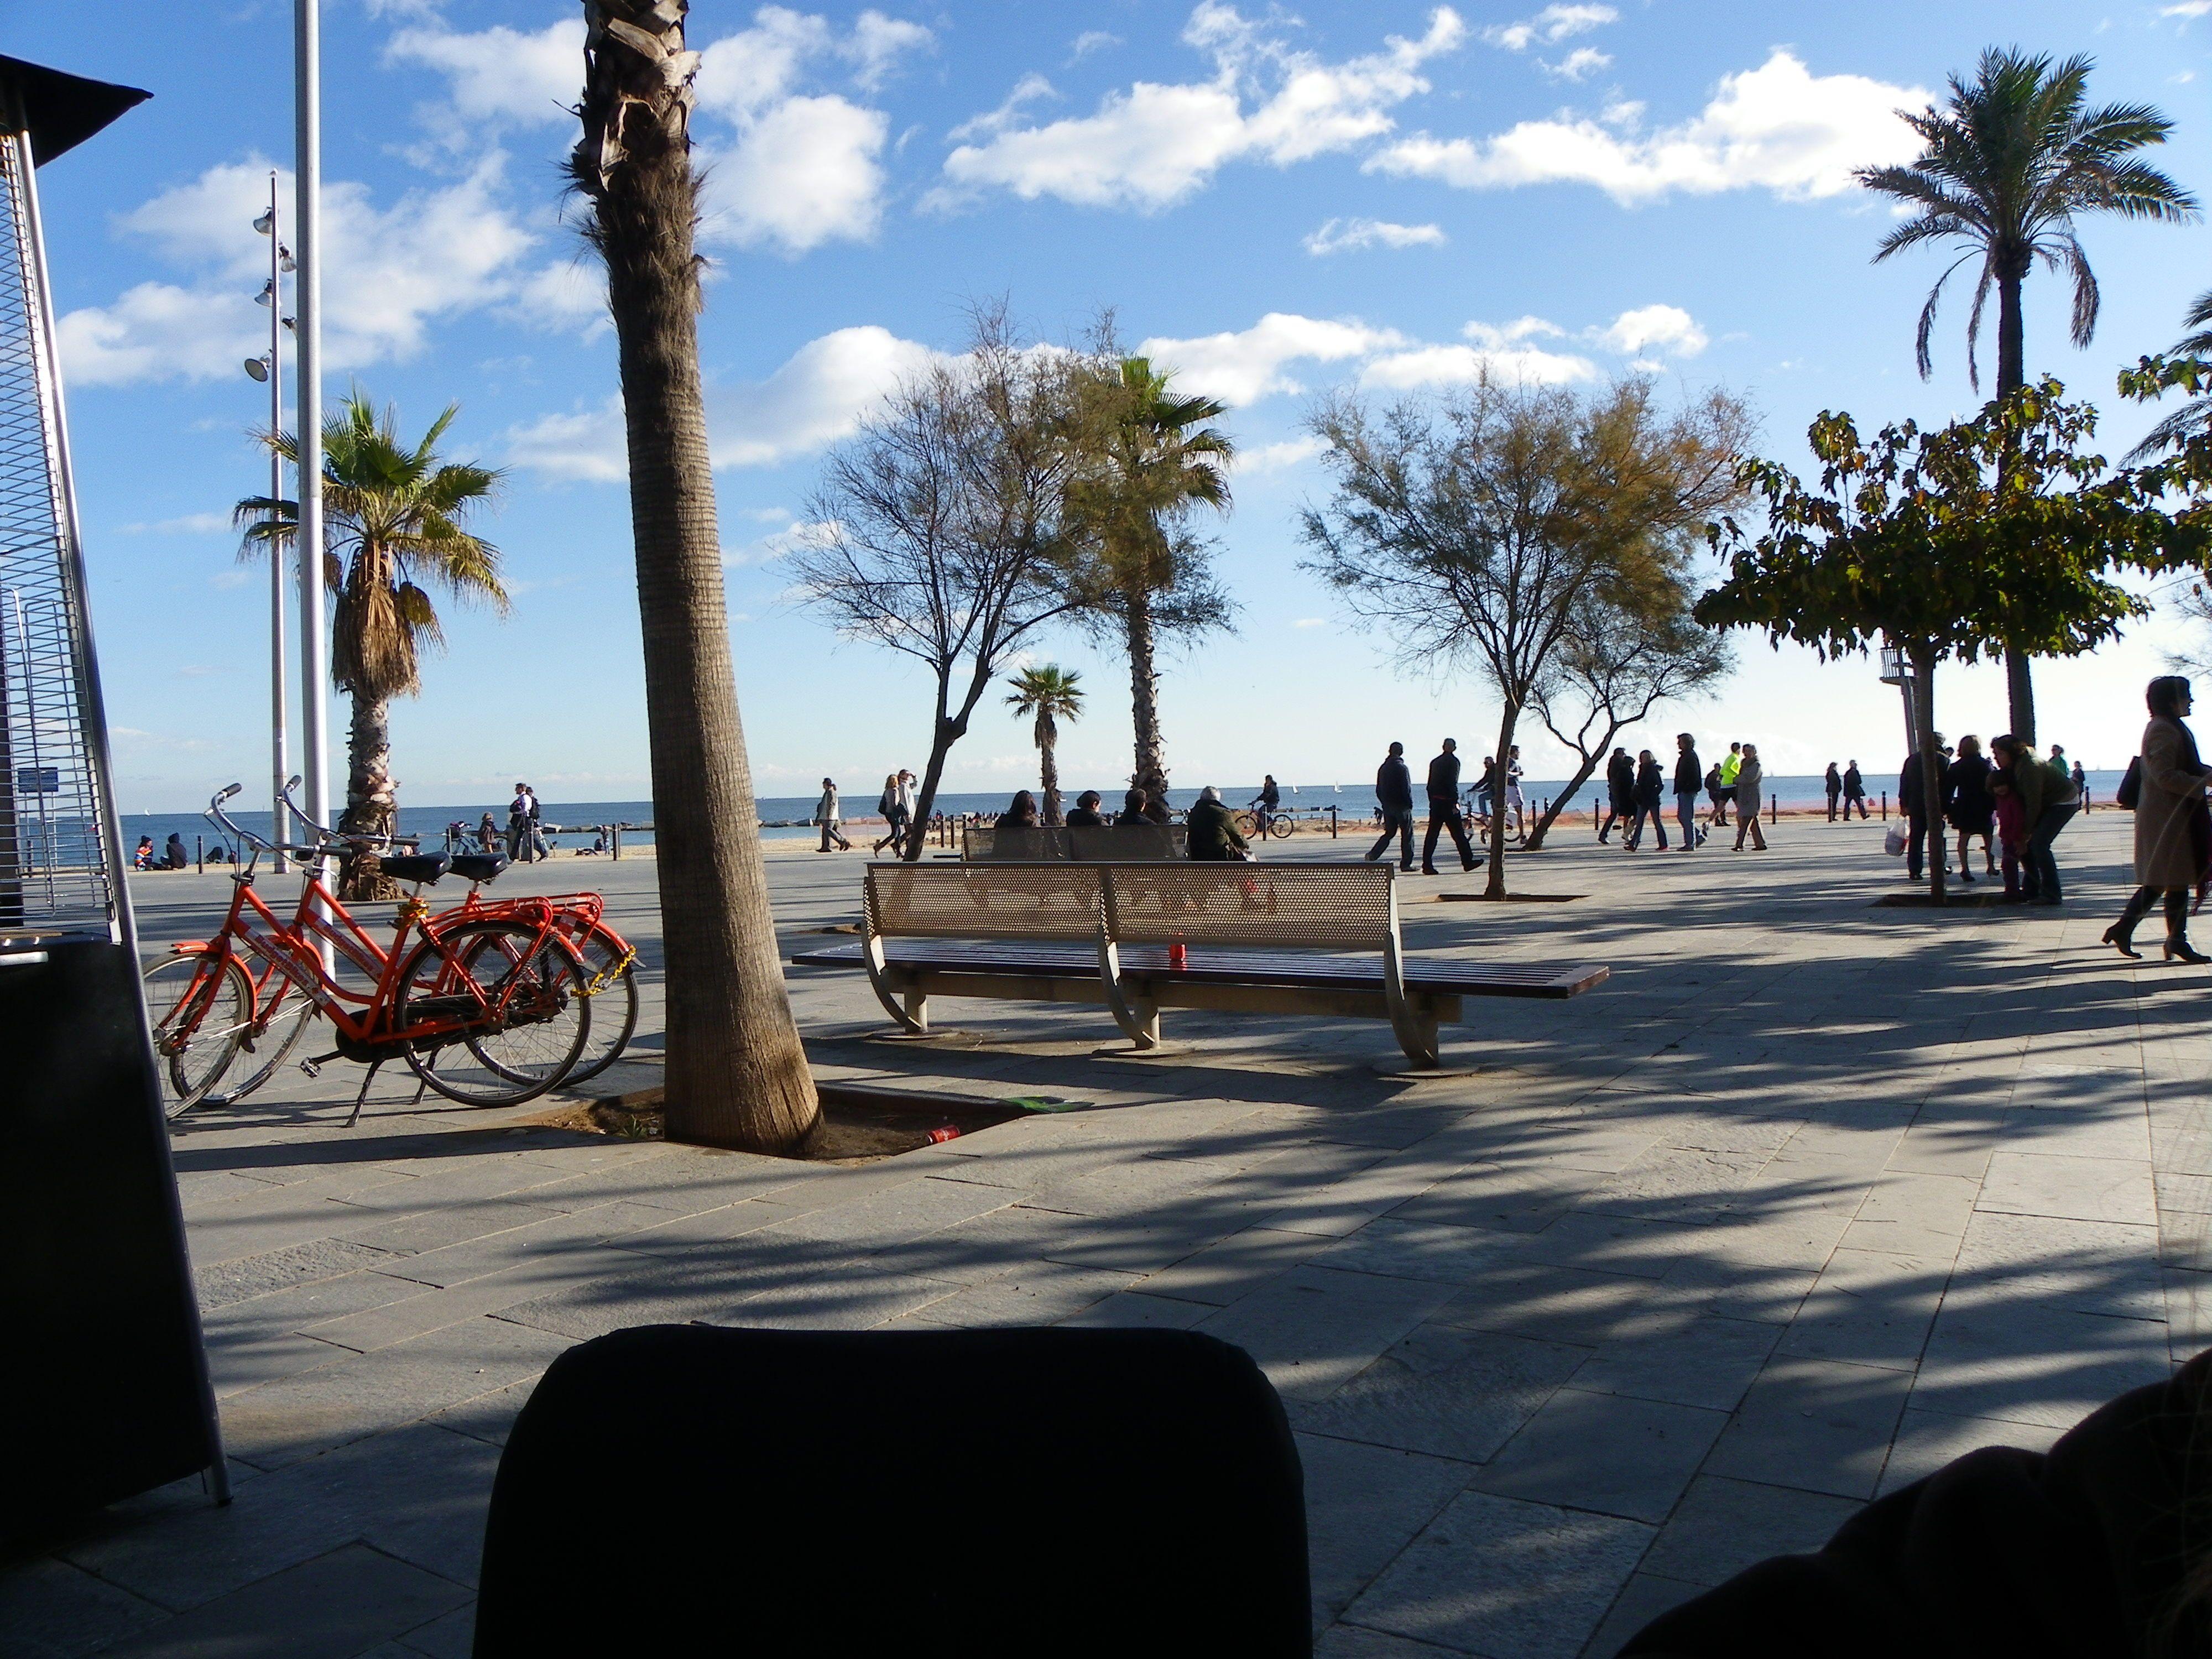 Barcelona, Playa. Barcelona, Casas, Fotos de barcelona